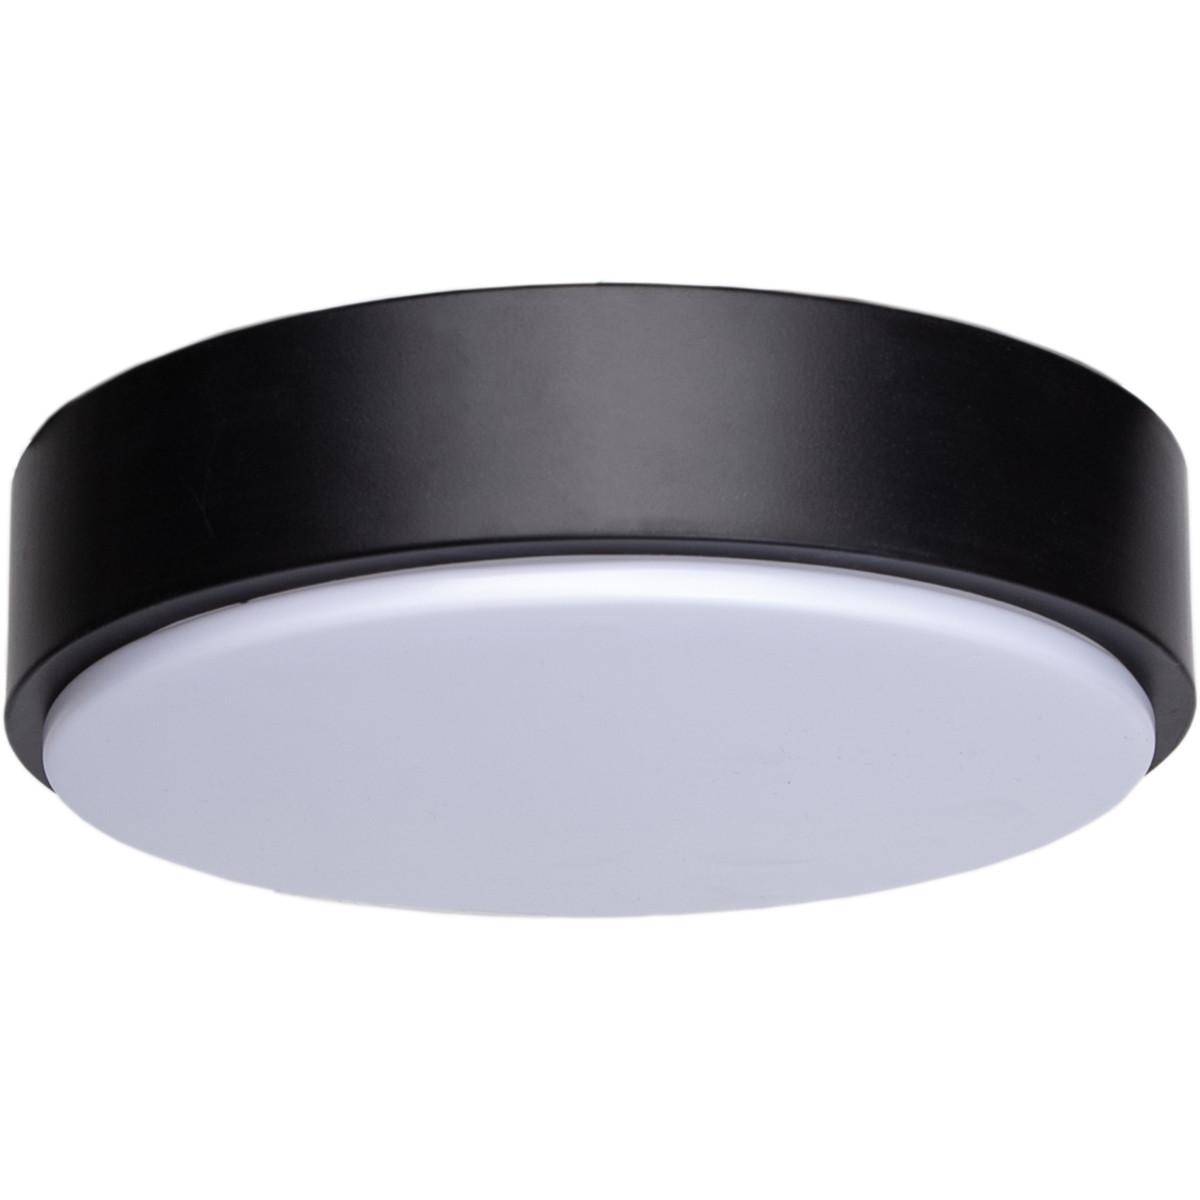 LED Plafondlamp - Aigi Santi - Opbouw Rond 12W - Helder/Koud Wit 6500K - Mat Zwart Aluminium